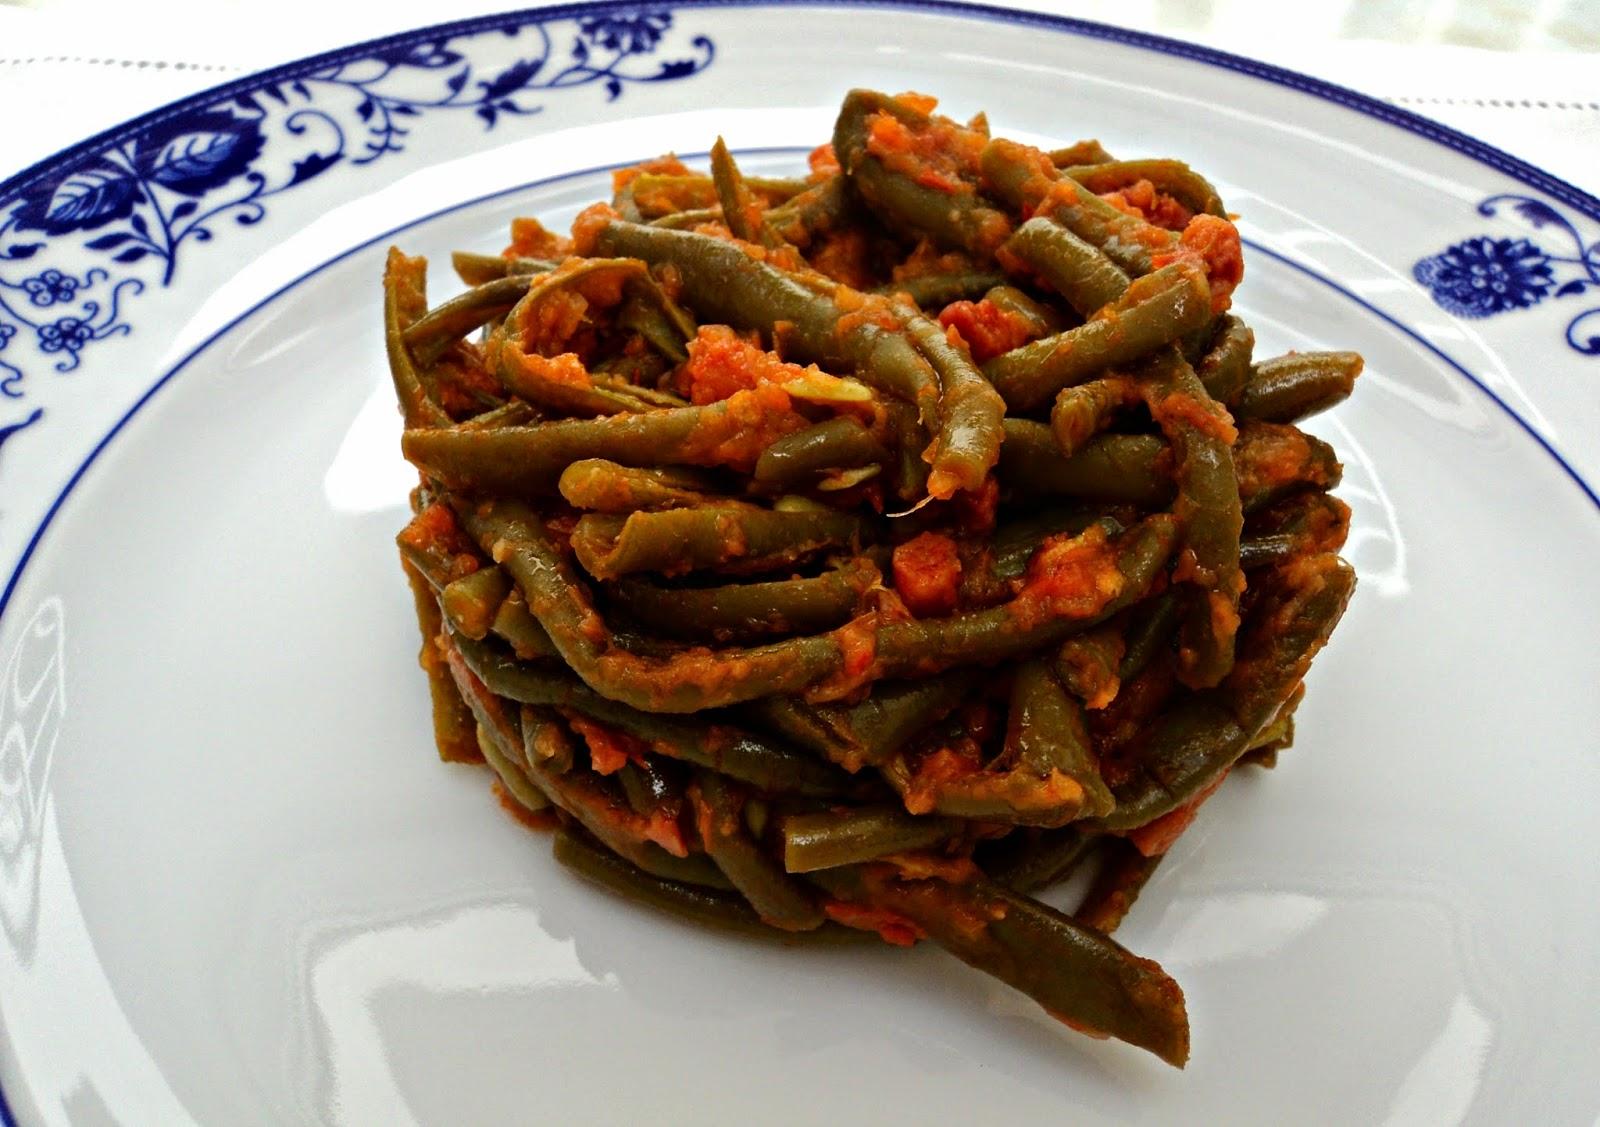 ensalada-judias-verdes-tomate-jamon-cerca